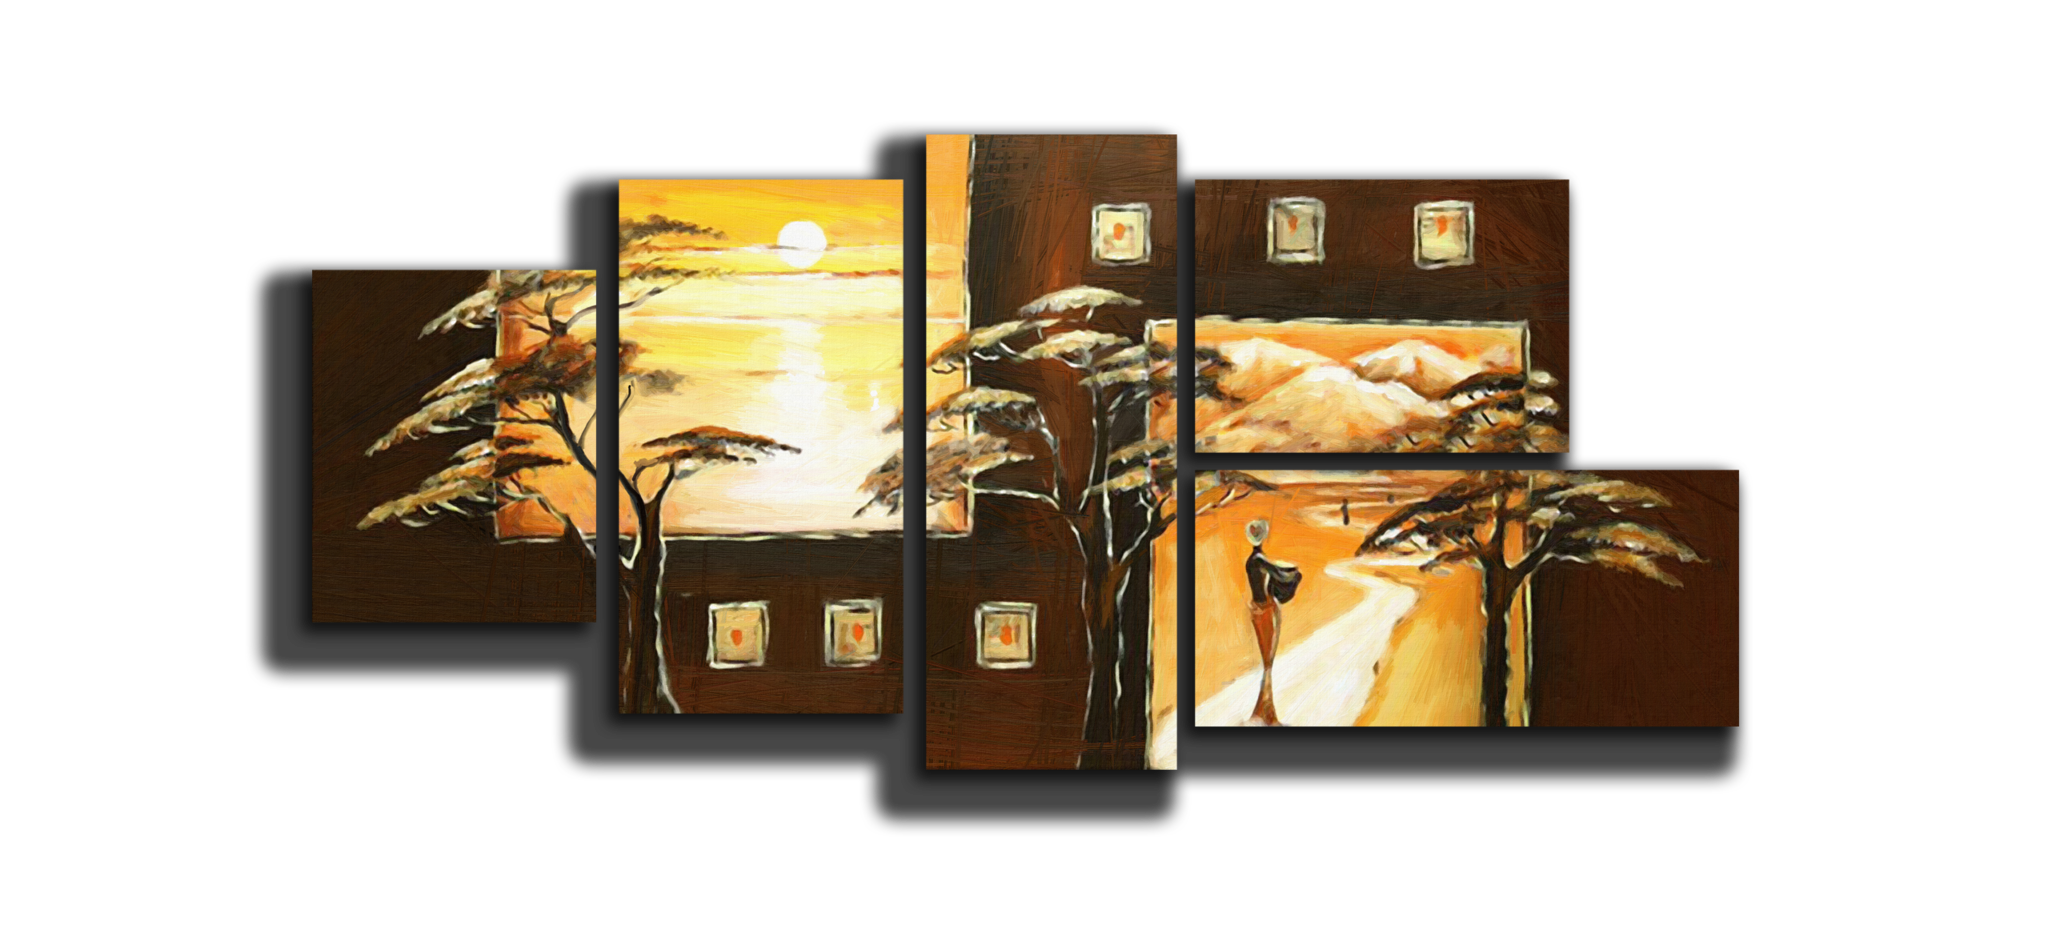 "Модульные картины Модульная картина ""Закат в саванне"" М329.psd5.png"